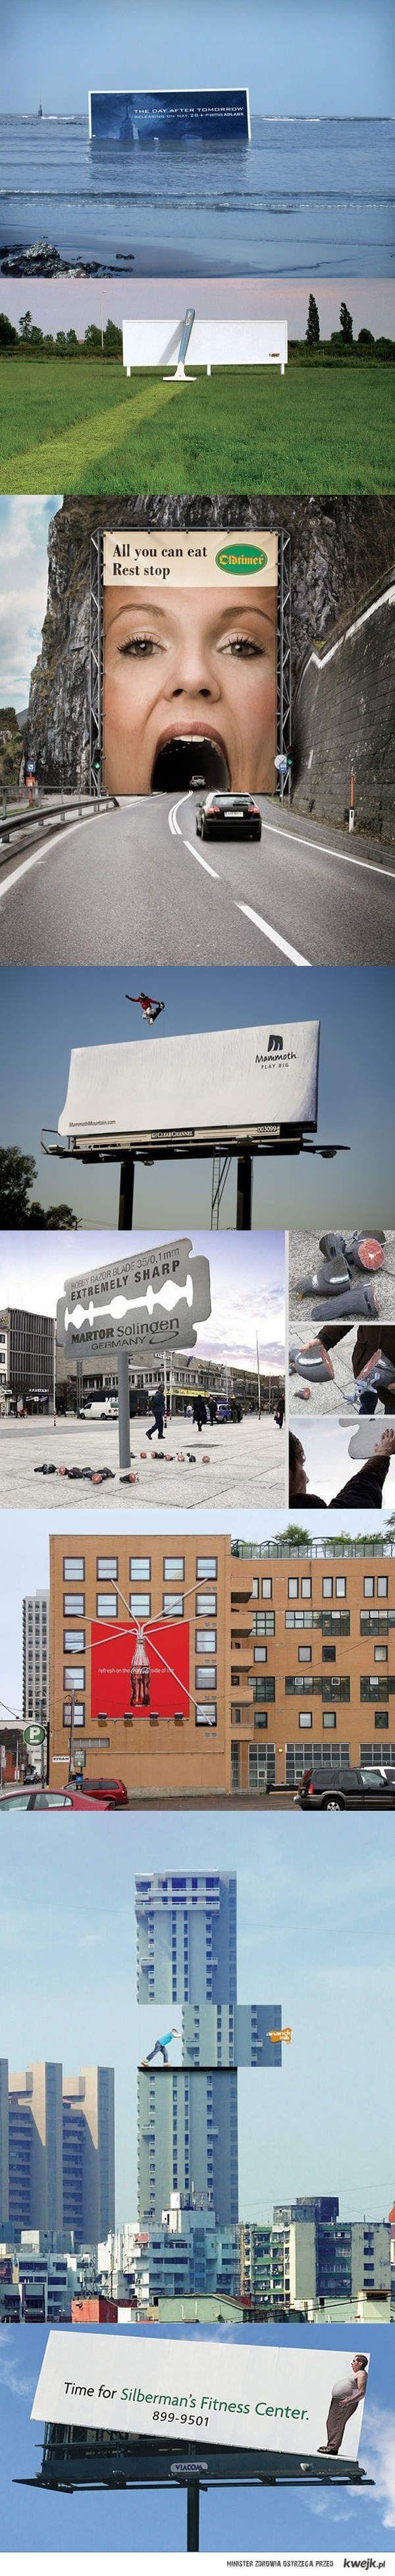 Kit Kat Ads Hippo Eaaefdebdddfcc